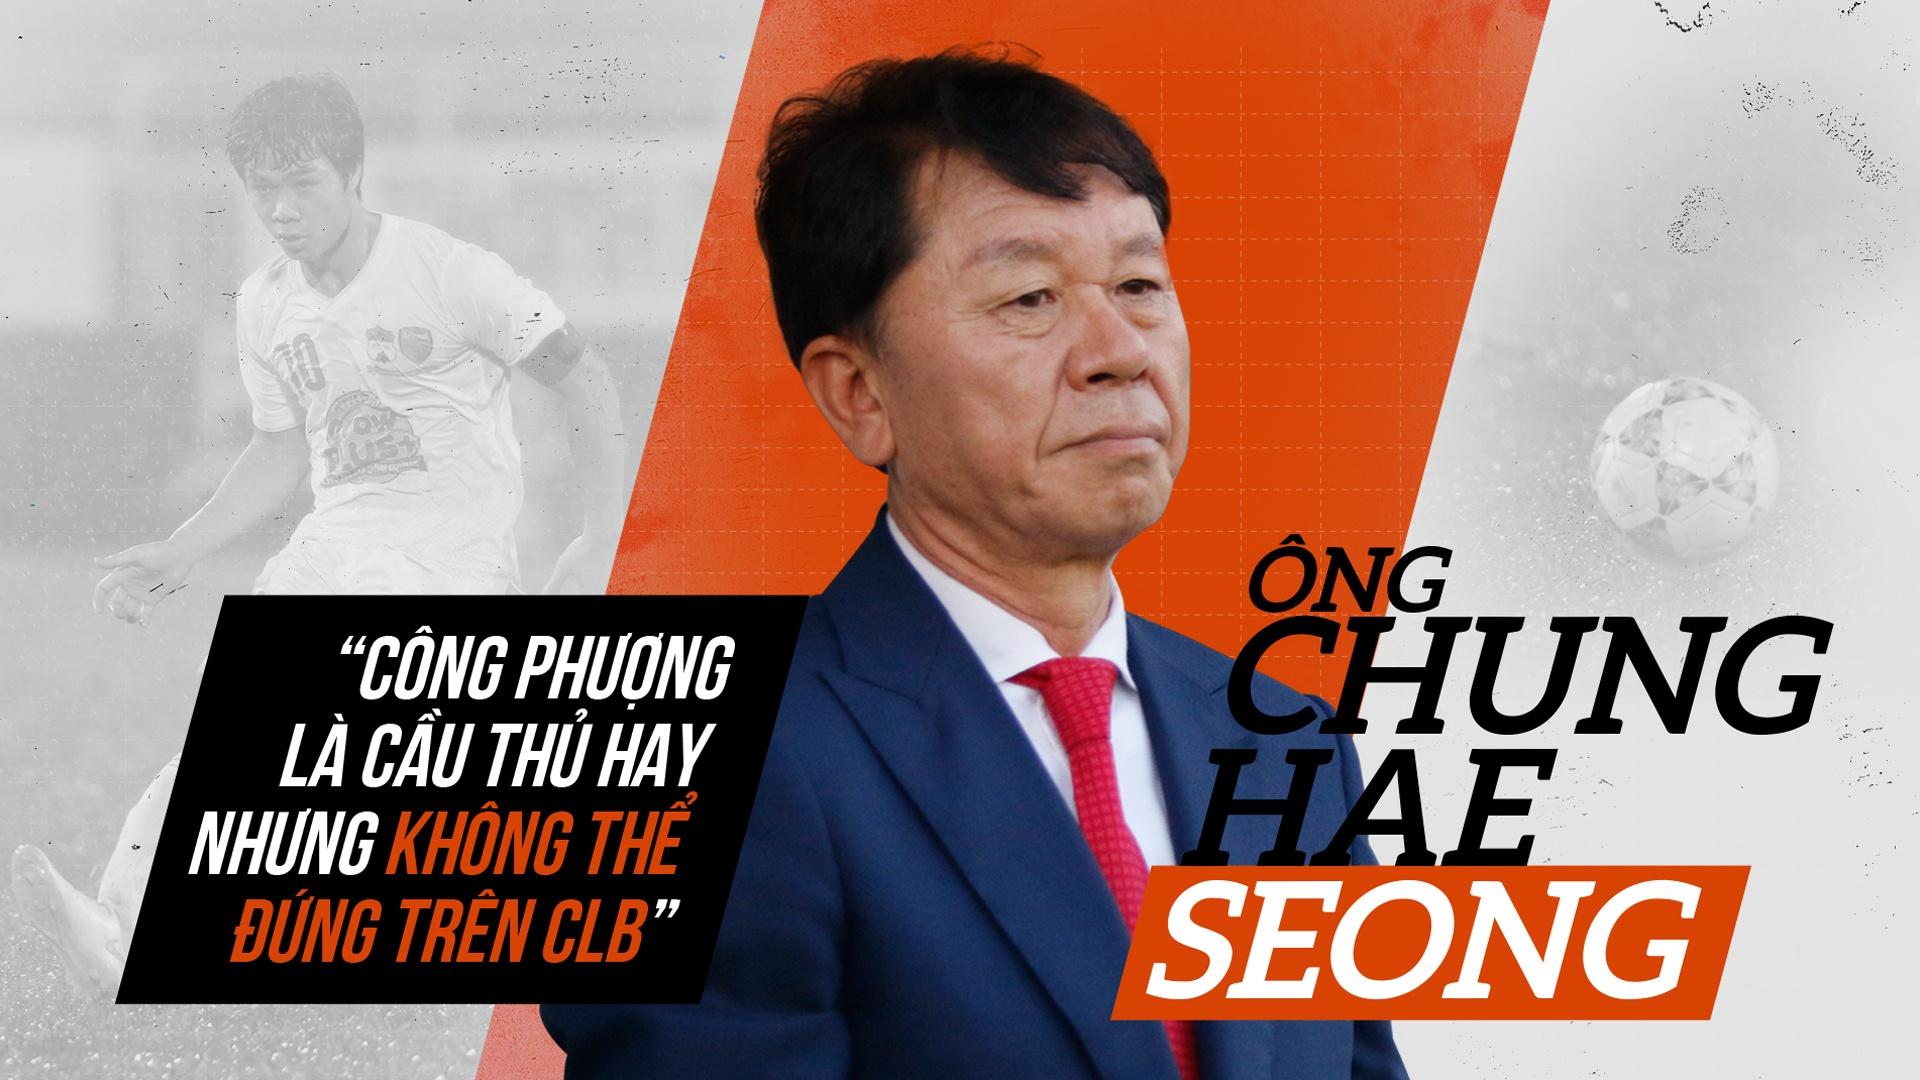 Chuyen gia Han Quoc: 'Cong Phuong hay nhung khong dung tren CLB' hinh anh 2